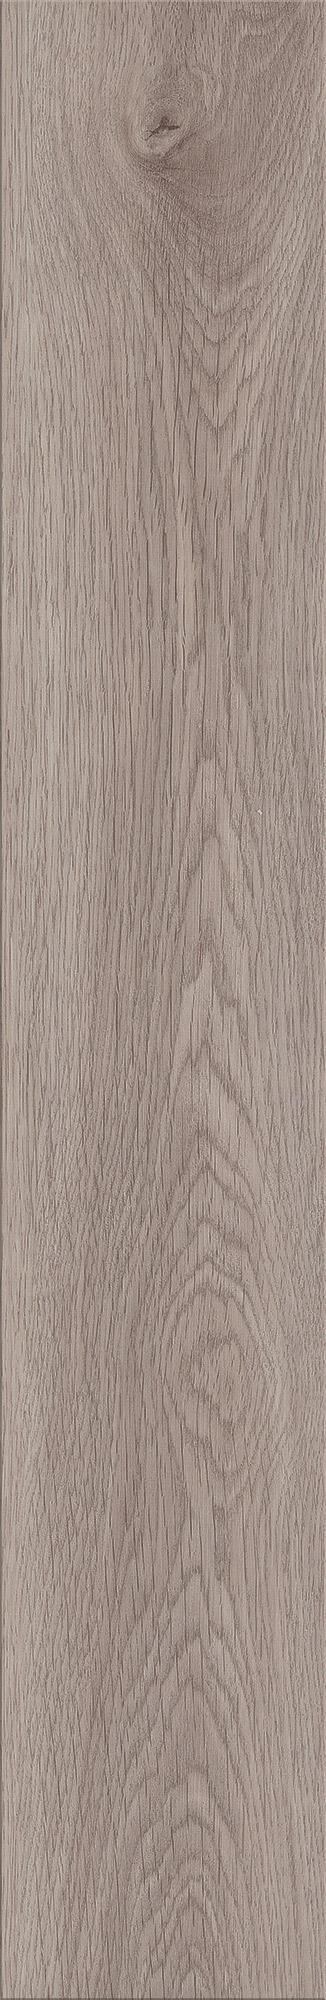 Pearl Oak Vinyl Click Flooring Luvanto BULK BUY long image